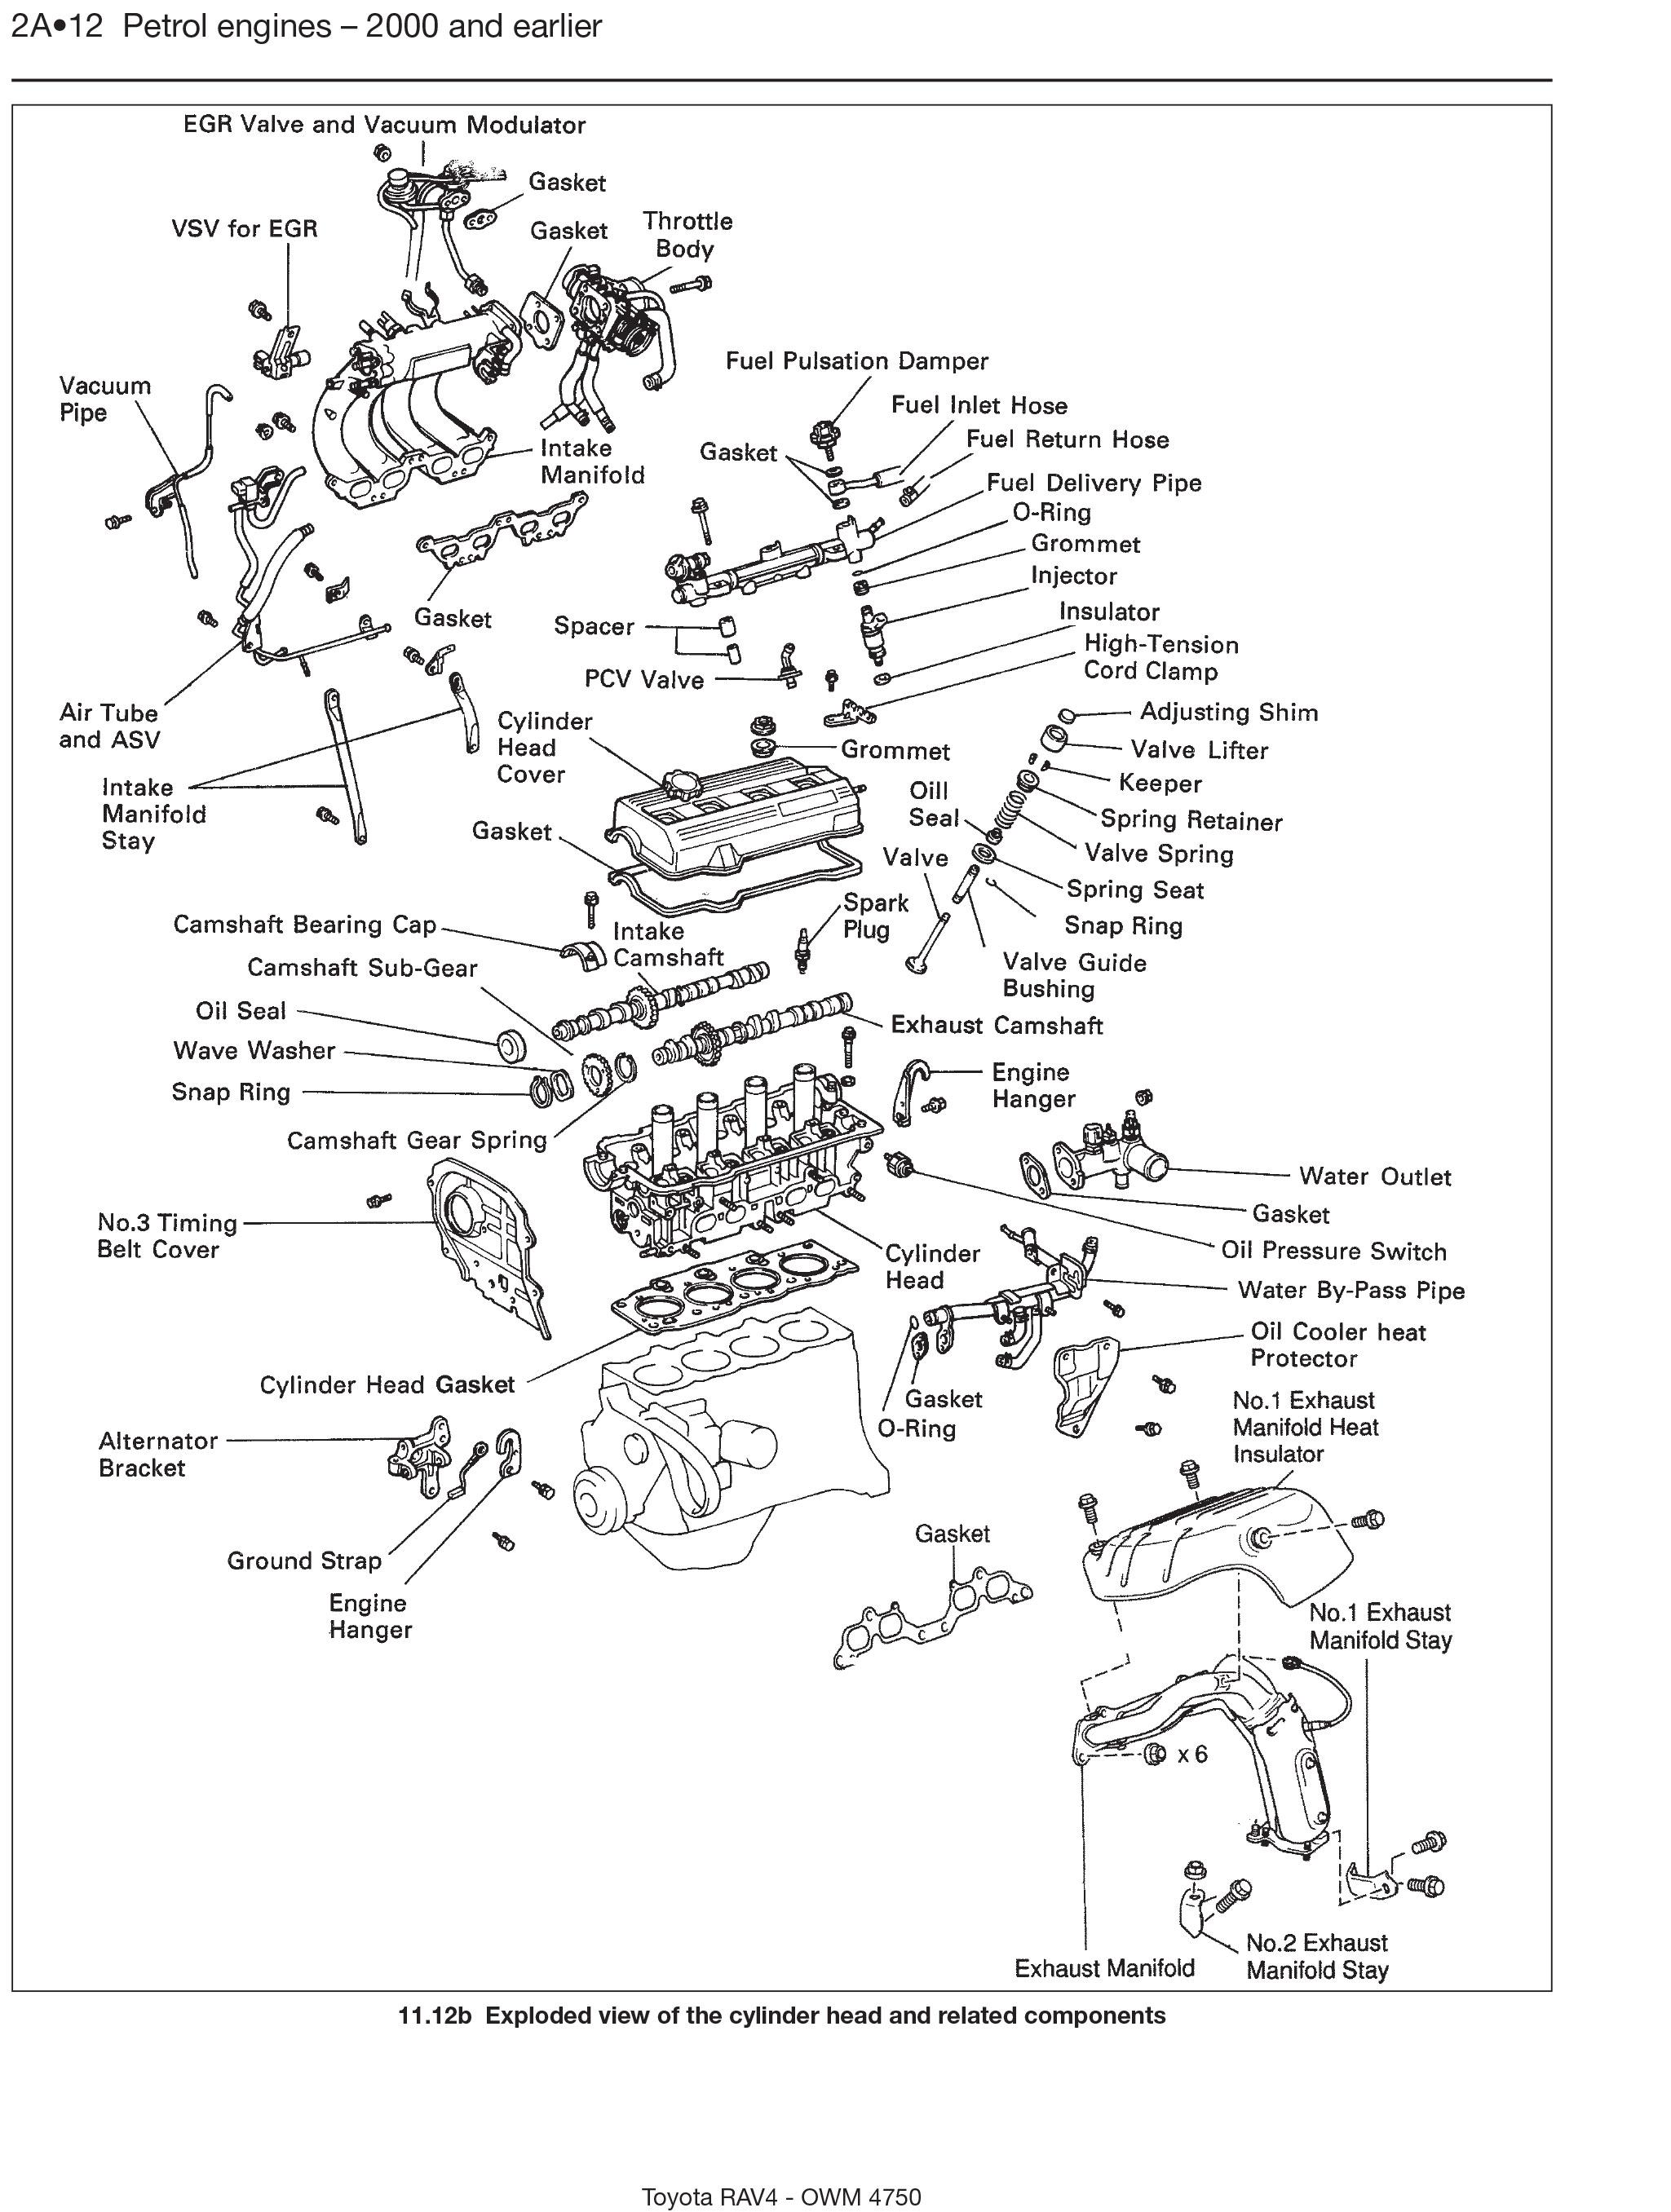 diagram] 98 toyota rav4 manual transmission diagram full version hd quality  transmission diagram - ladderdiagram.vinciconmareblu.it  diagram database